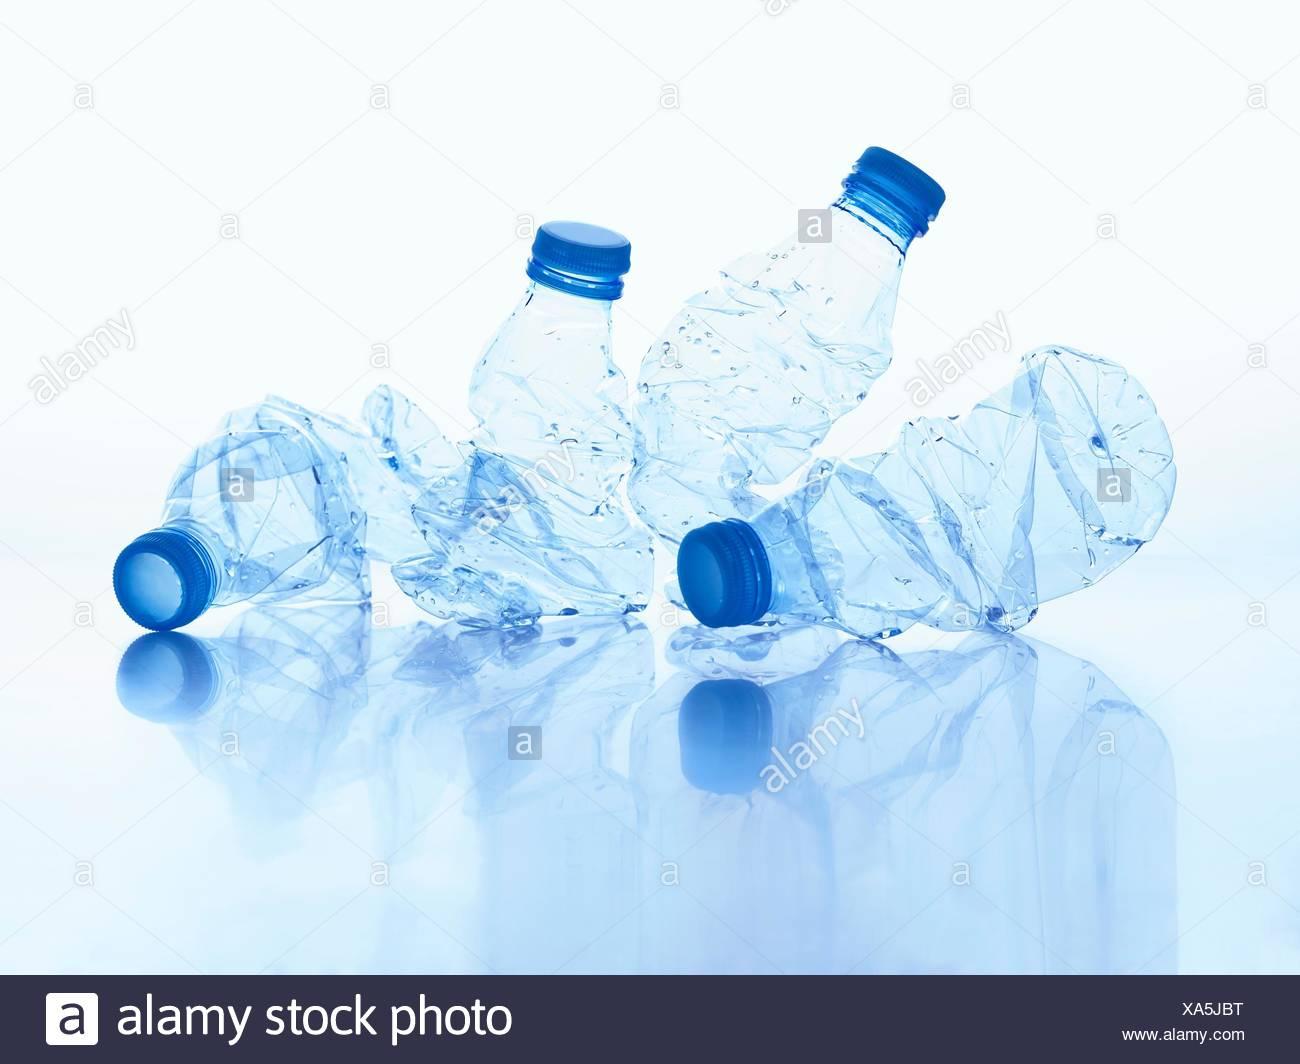 Crushed plastic bottles, studio shot. - Stock Image